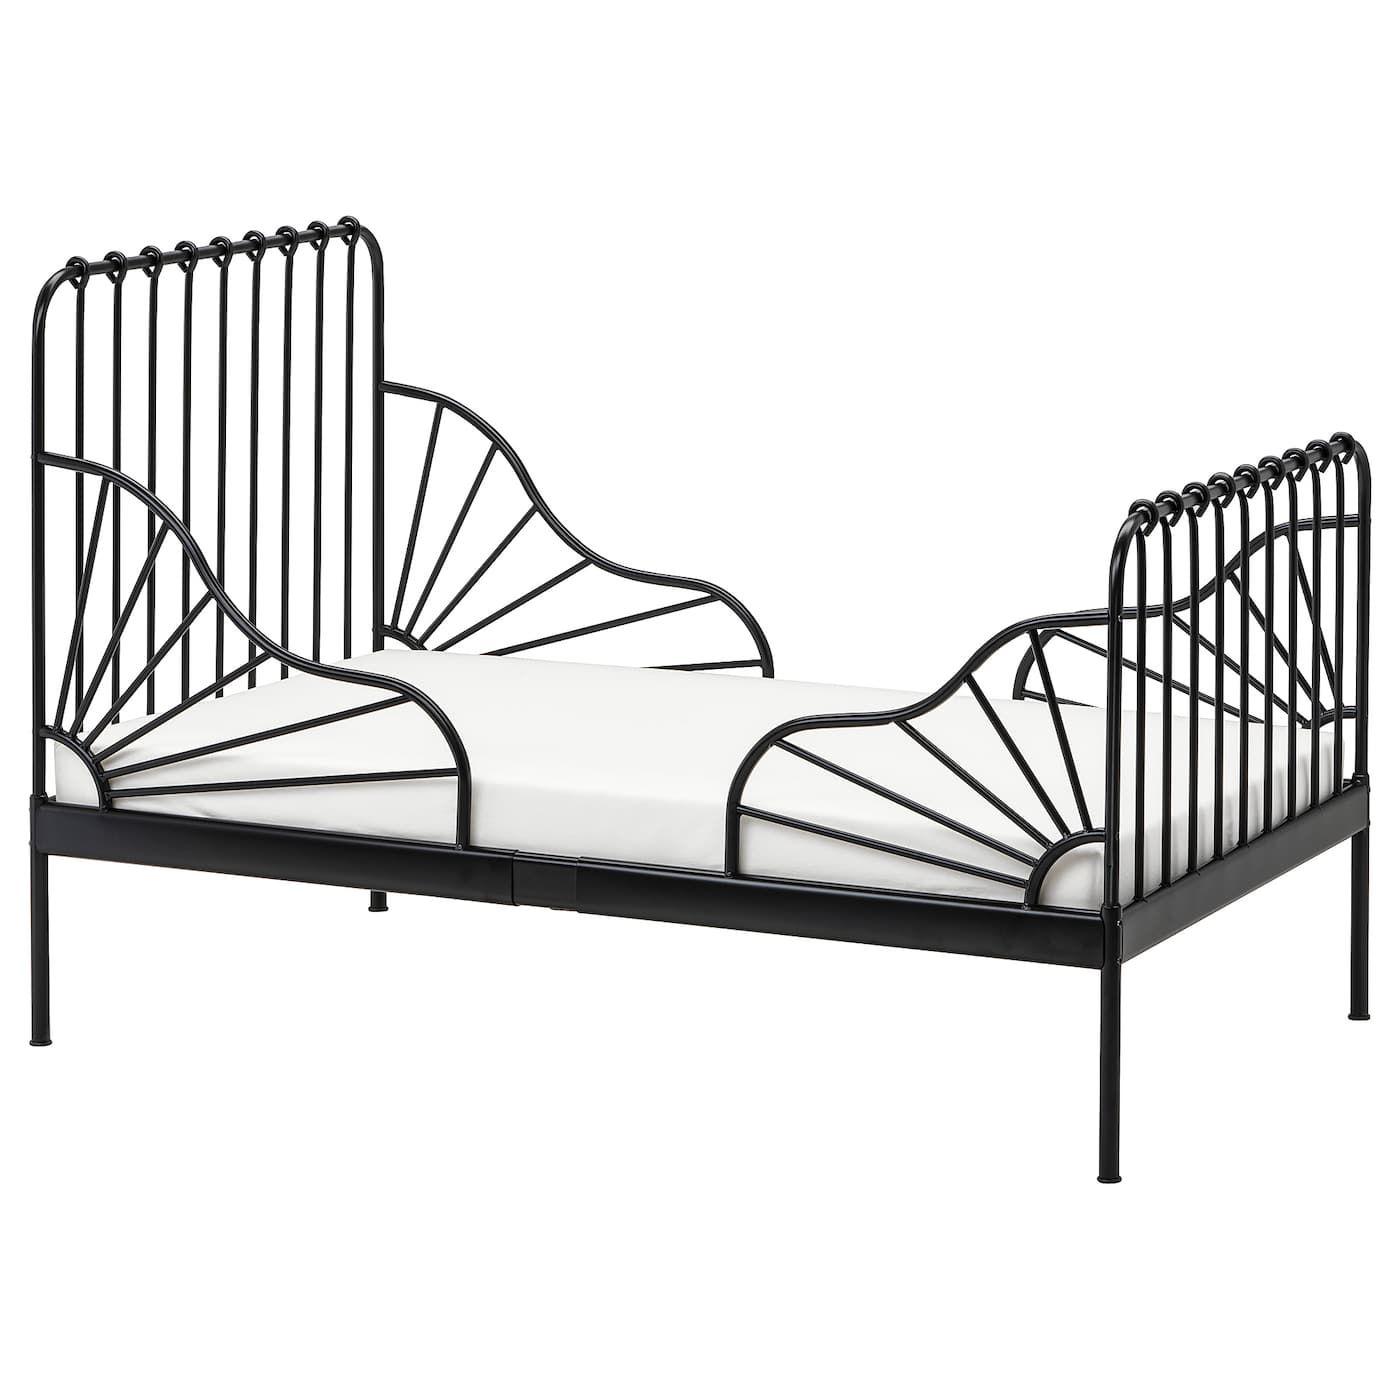 Ext Bed Frame With Slatted Bed Base Black 38 1 4x74 3 4 Bed